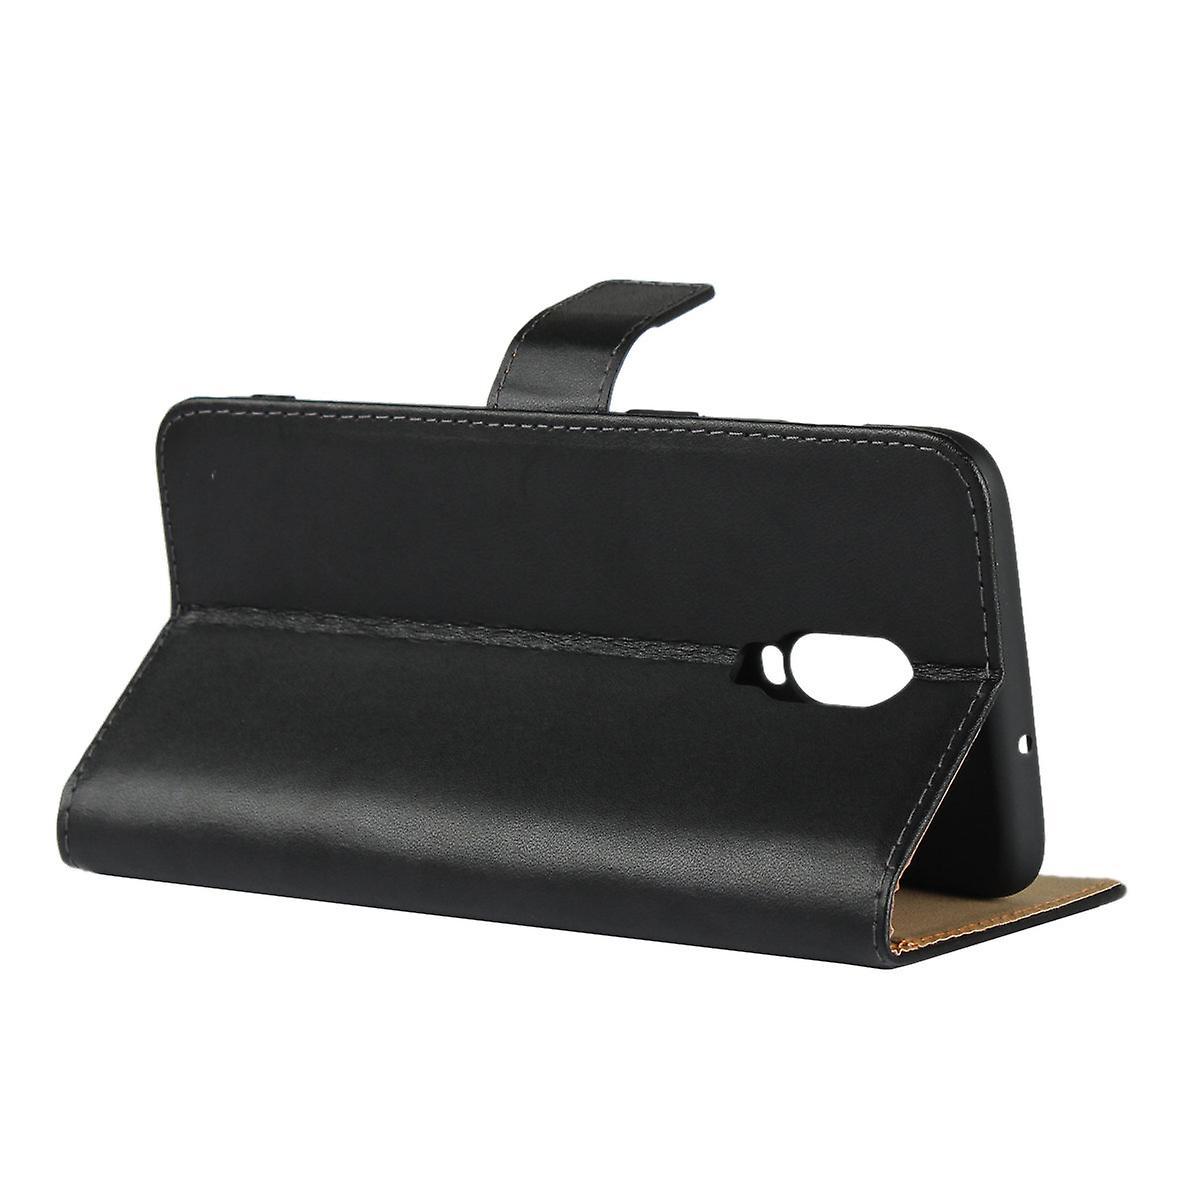 iCoverCase | OnePlus 6T | Plånboksfodral |